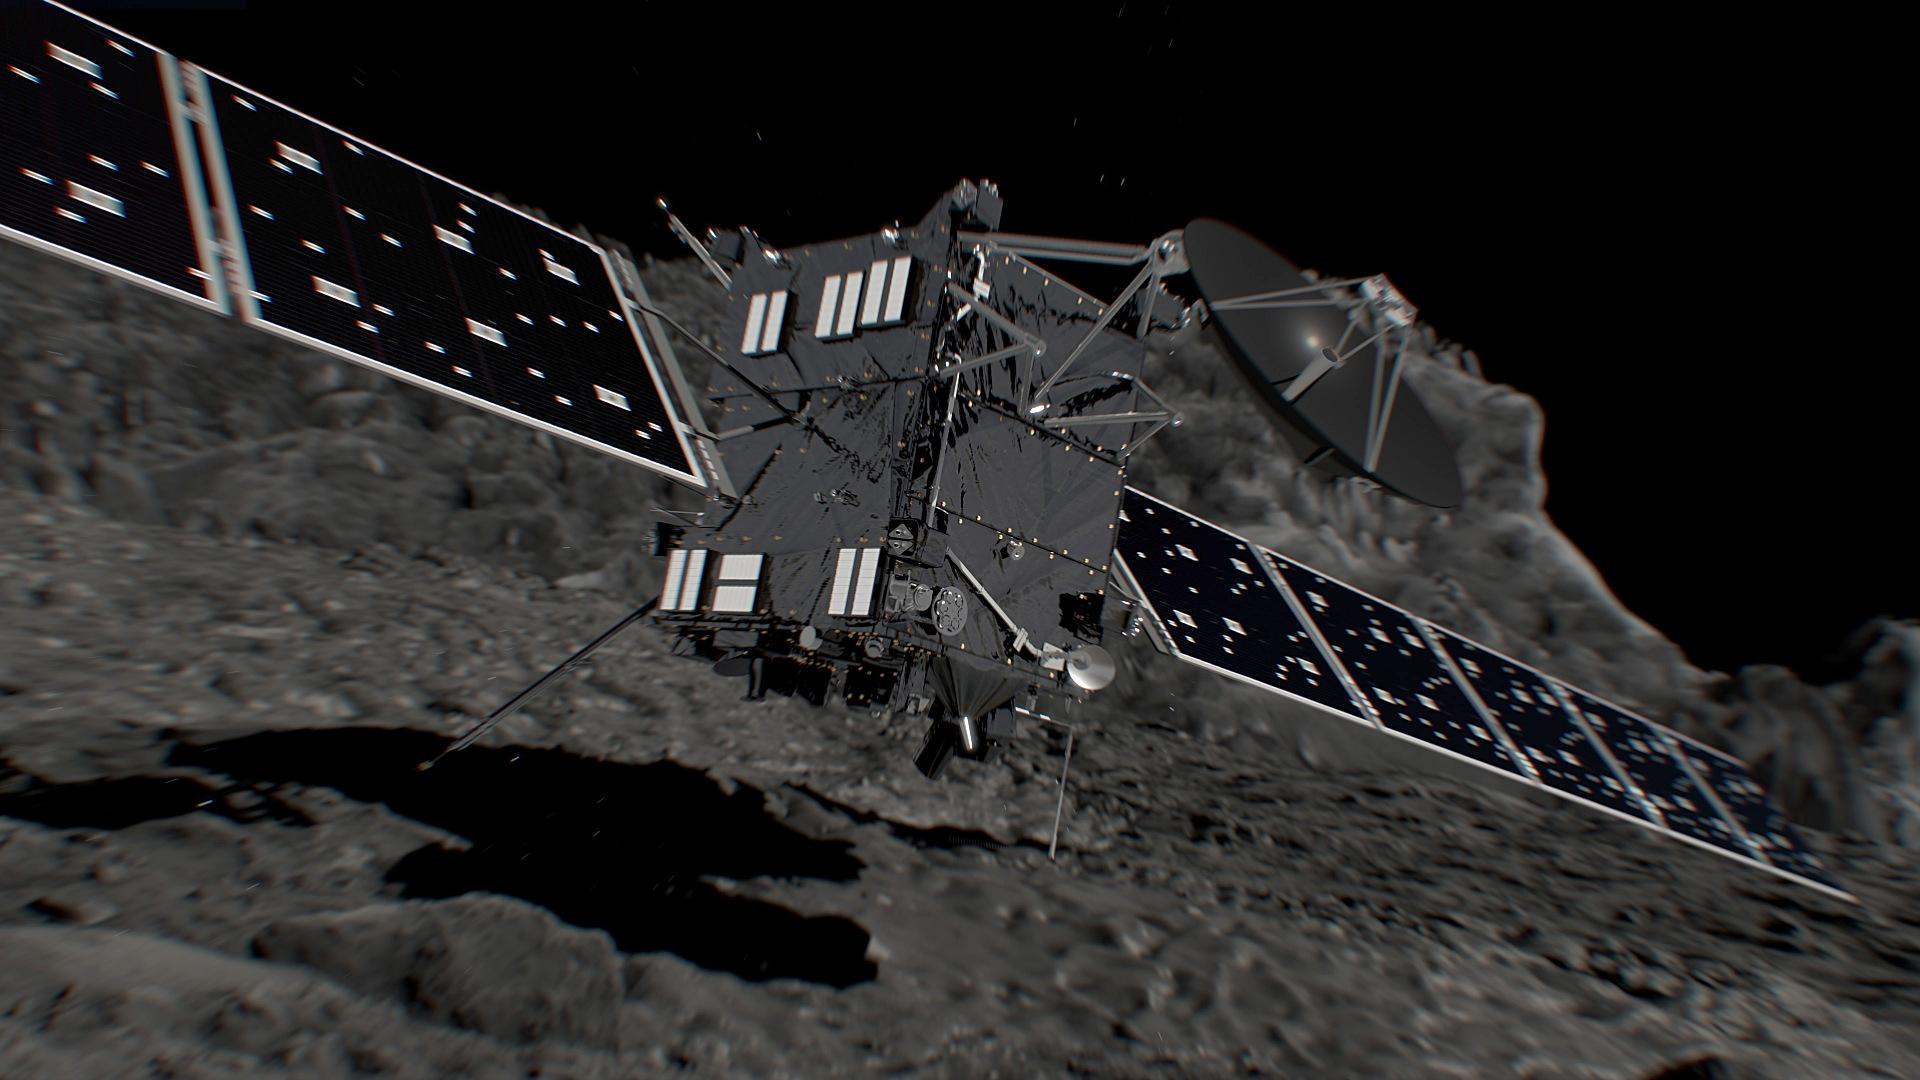 Artist's impression of ESA's Rosetta spacecraft shortly before hitting Comet 67P/Churyumov–Gerasimenko on 30 September 2016. Illustration credits: ESA/ATG medialab.